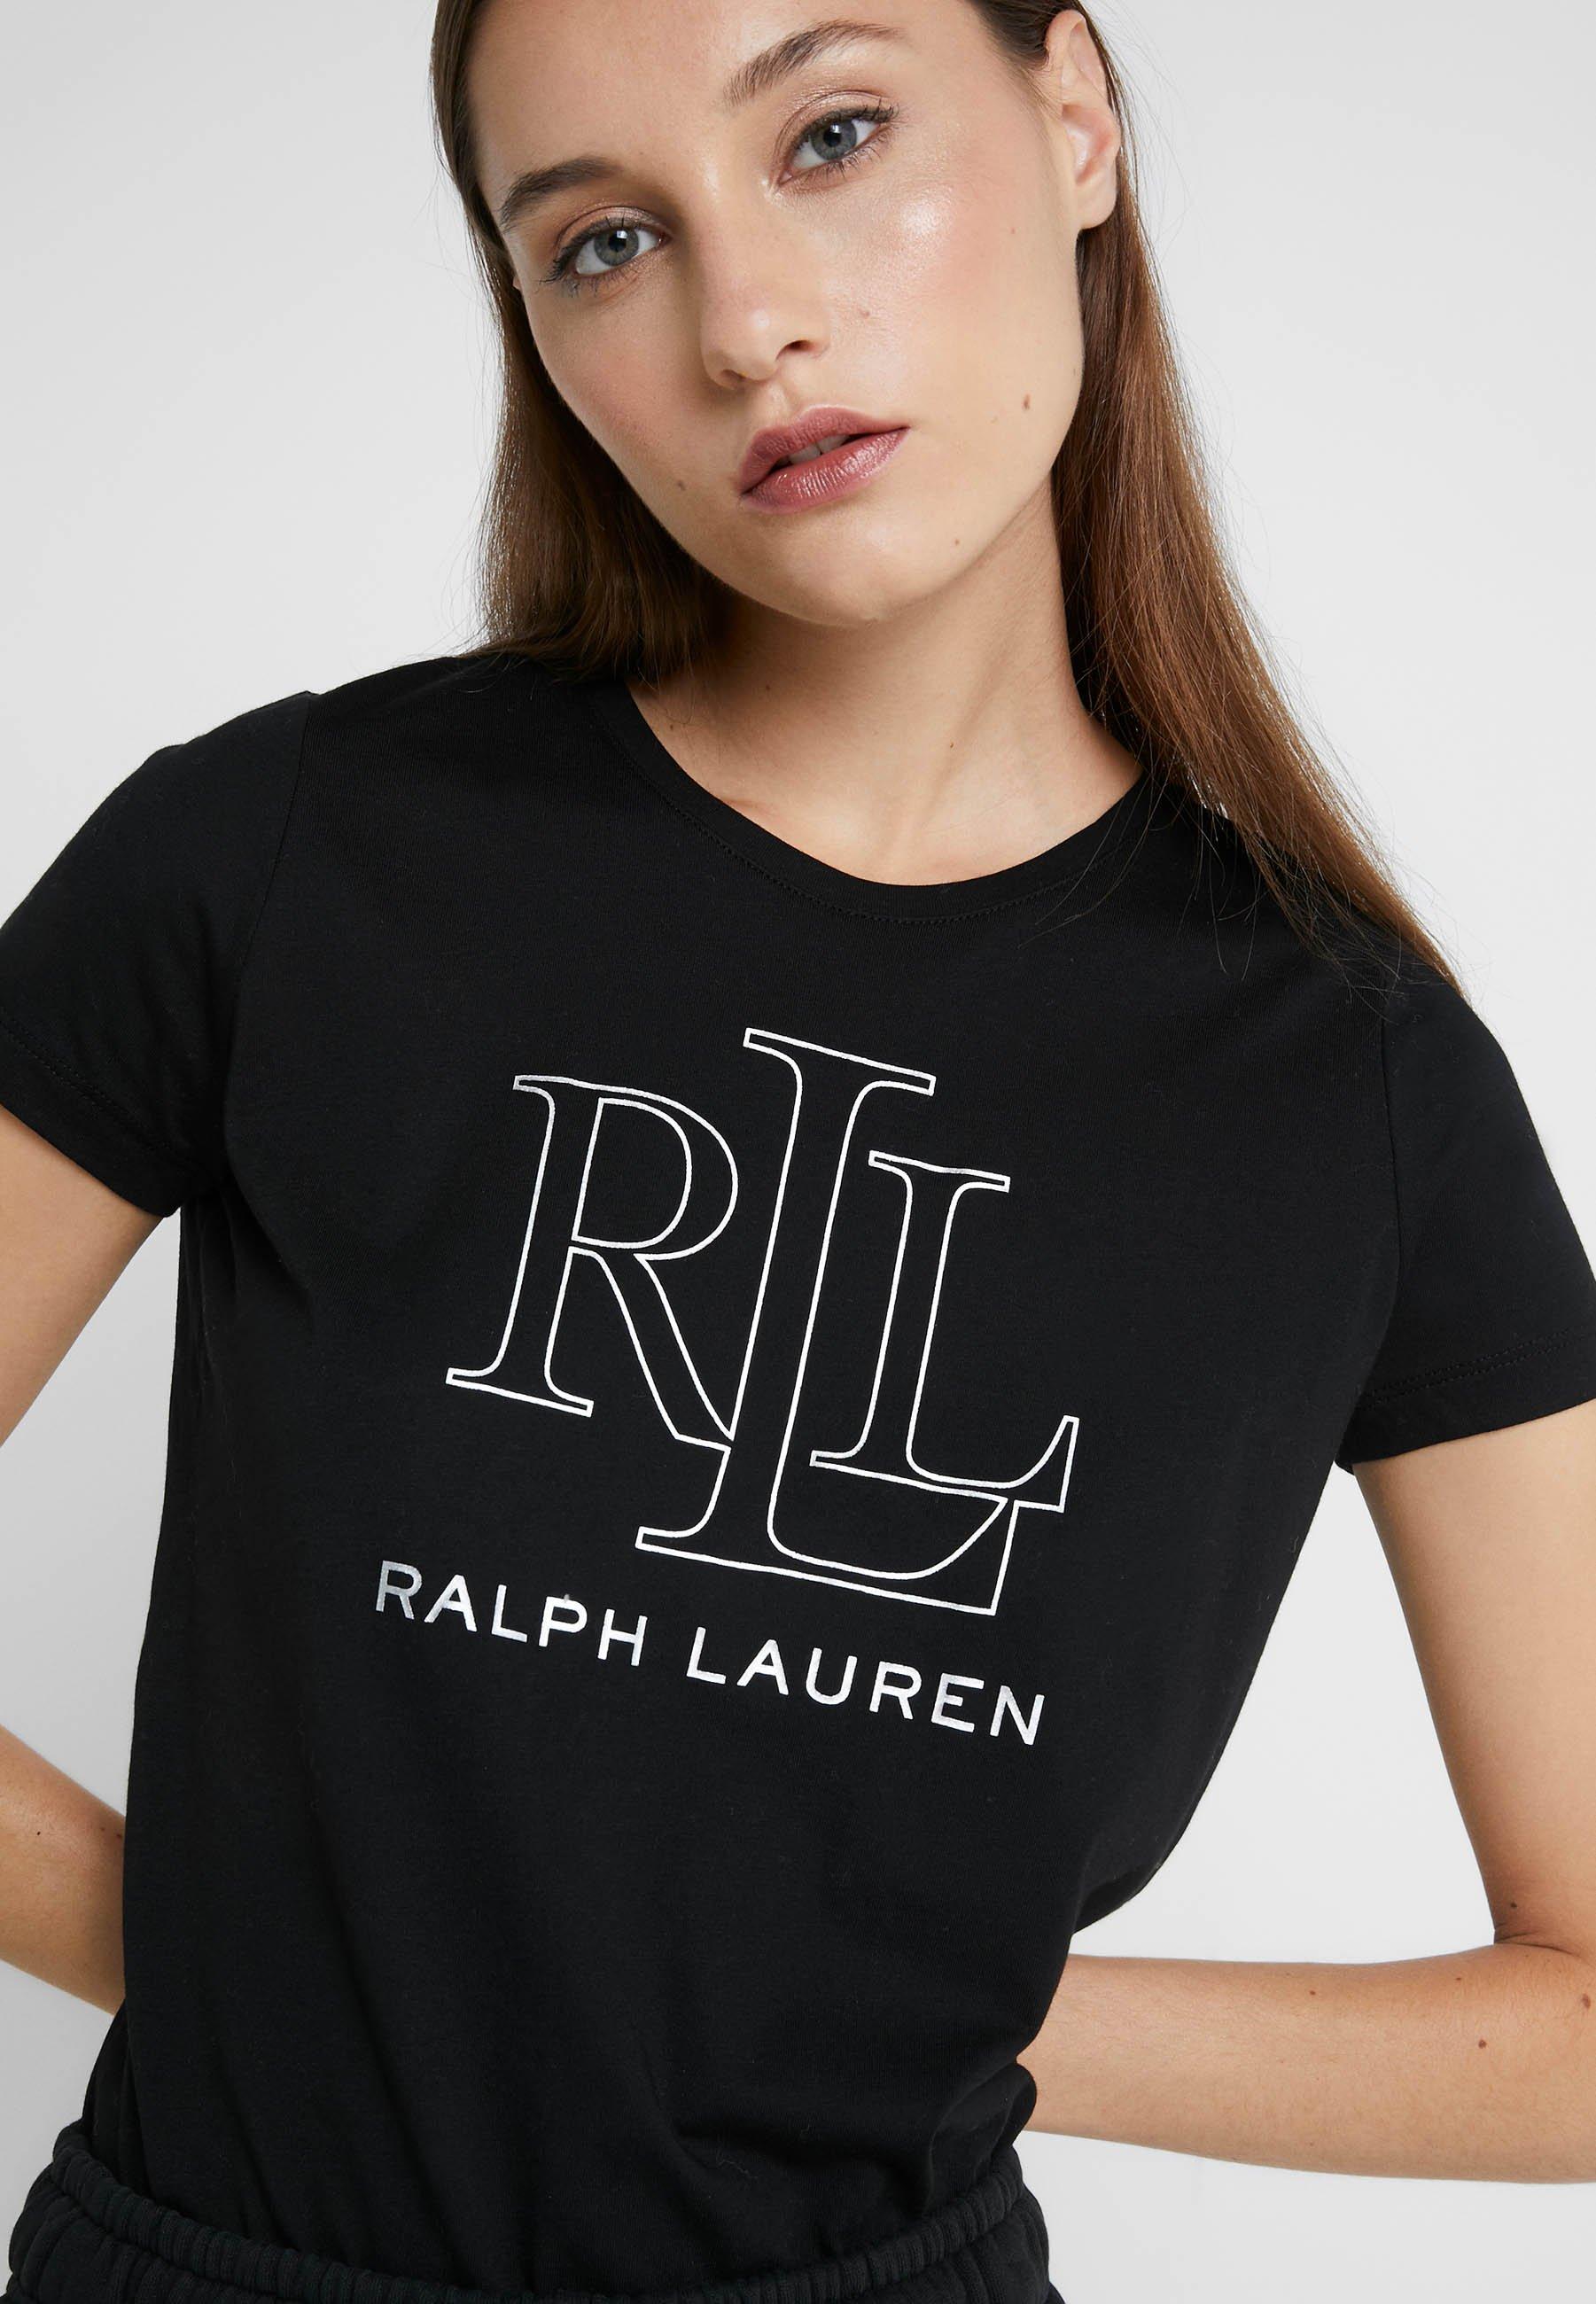 Lauren T shirt Ralph imprimé Lauren black F13cJT5luK